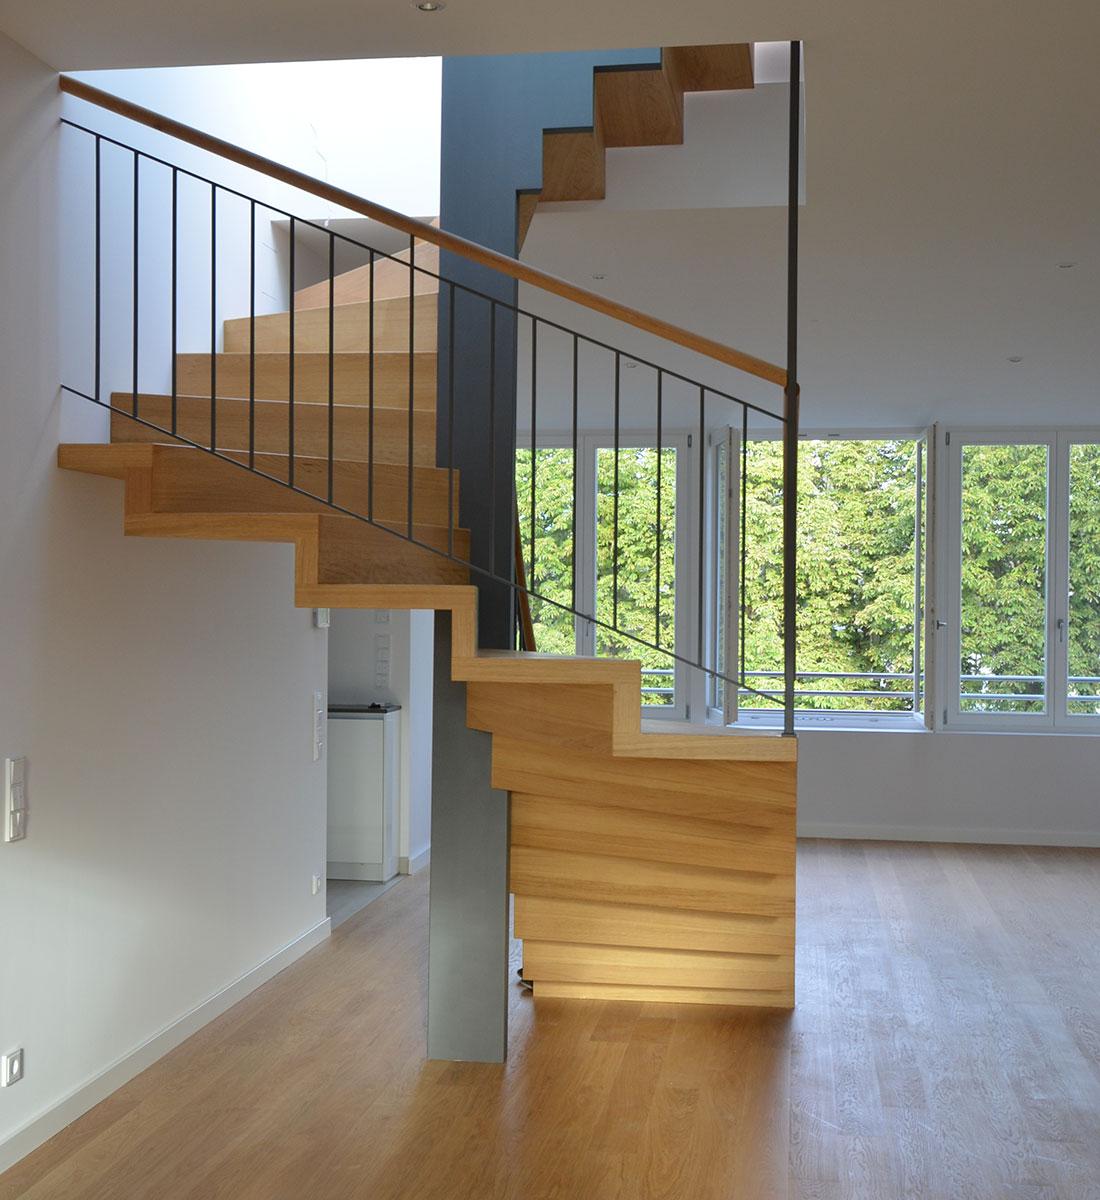 treppenbau diehl plz 60435 frankfurt freistehende faltwerktreppe treppen treppenbau. Black Bedroom Furniture Sets. Home Design Ideas